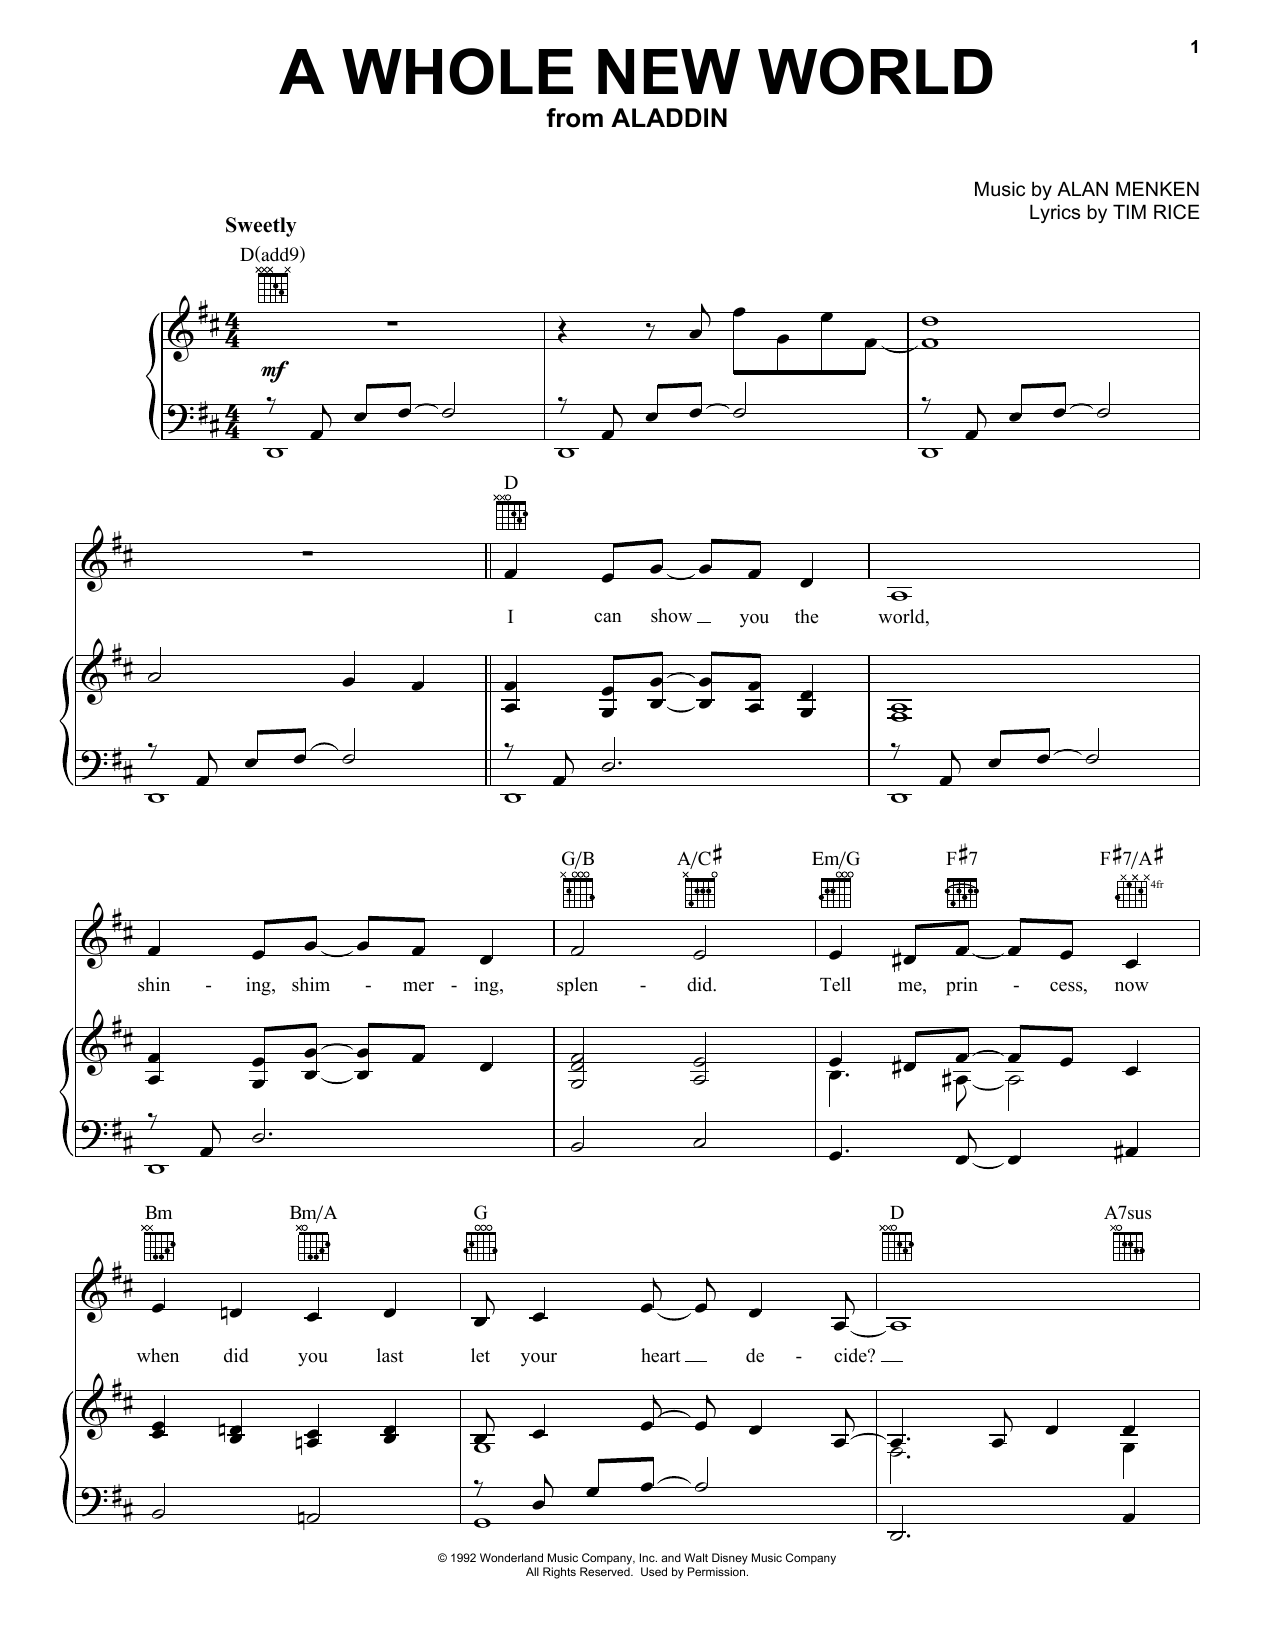 A Whole New World (from Aladdin) sheet music